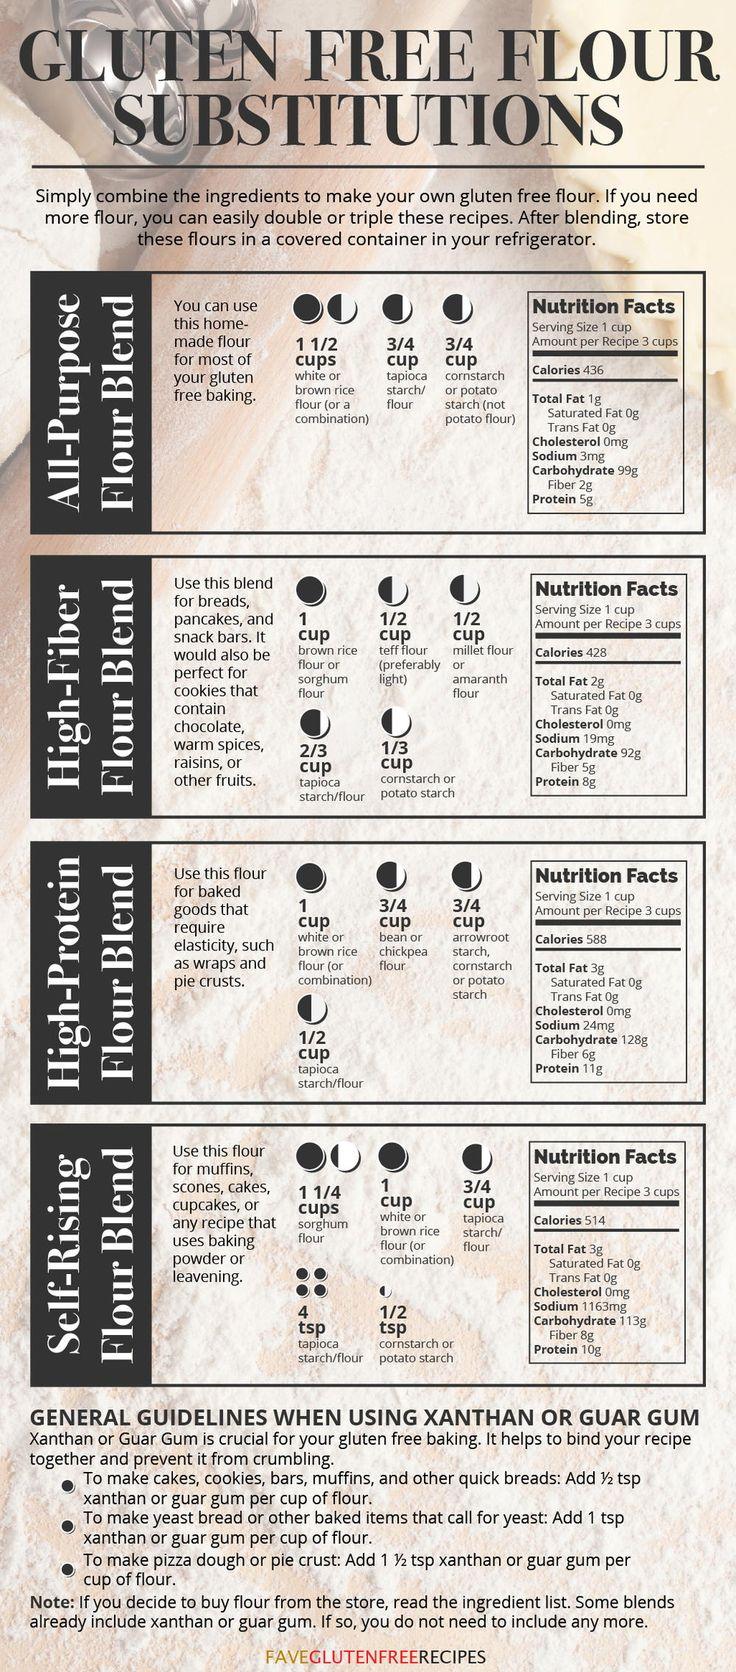 Gluten Free Flour Substitutions | FaveGlutenFreeRecipes.com